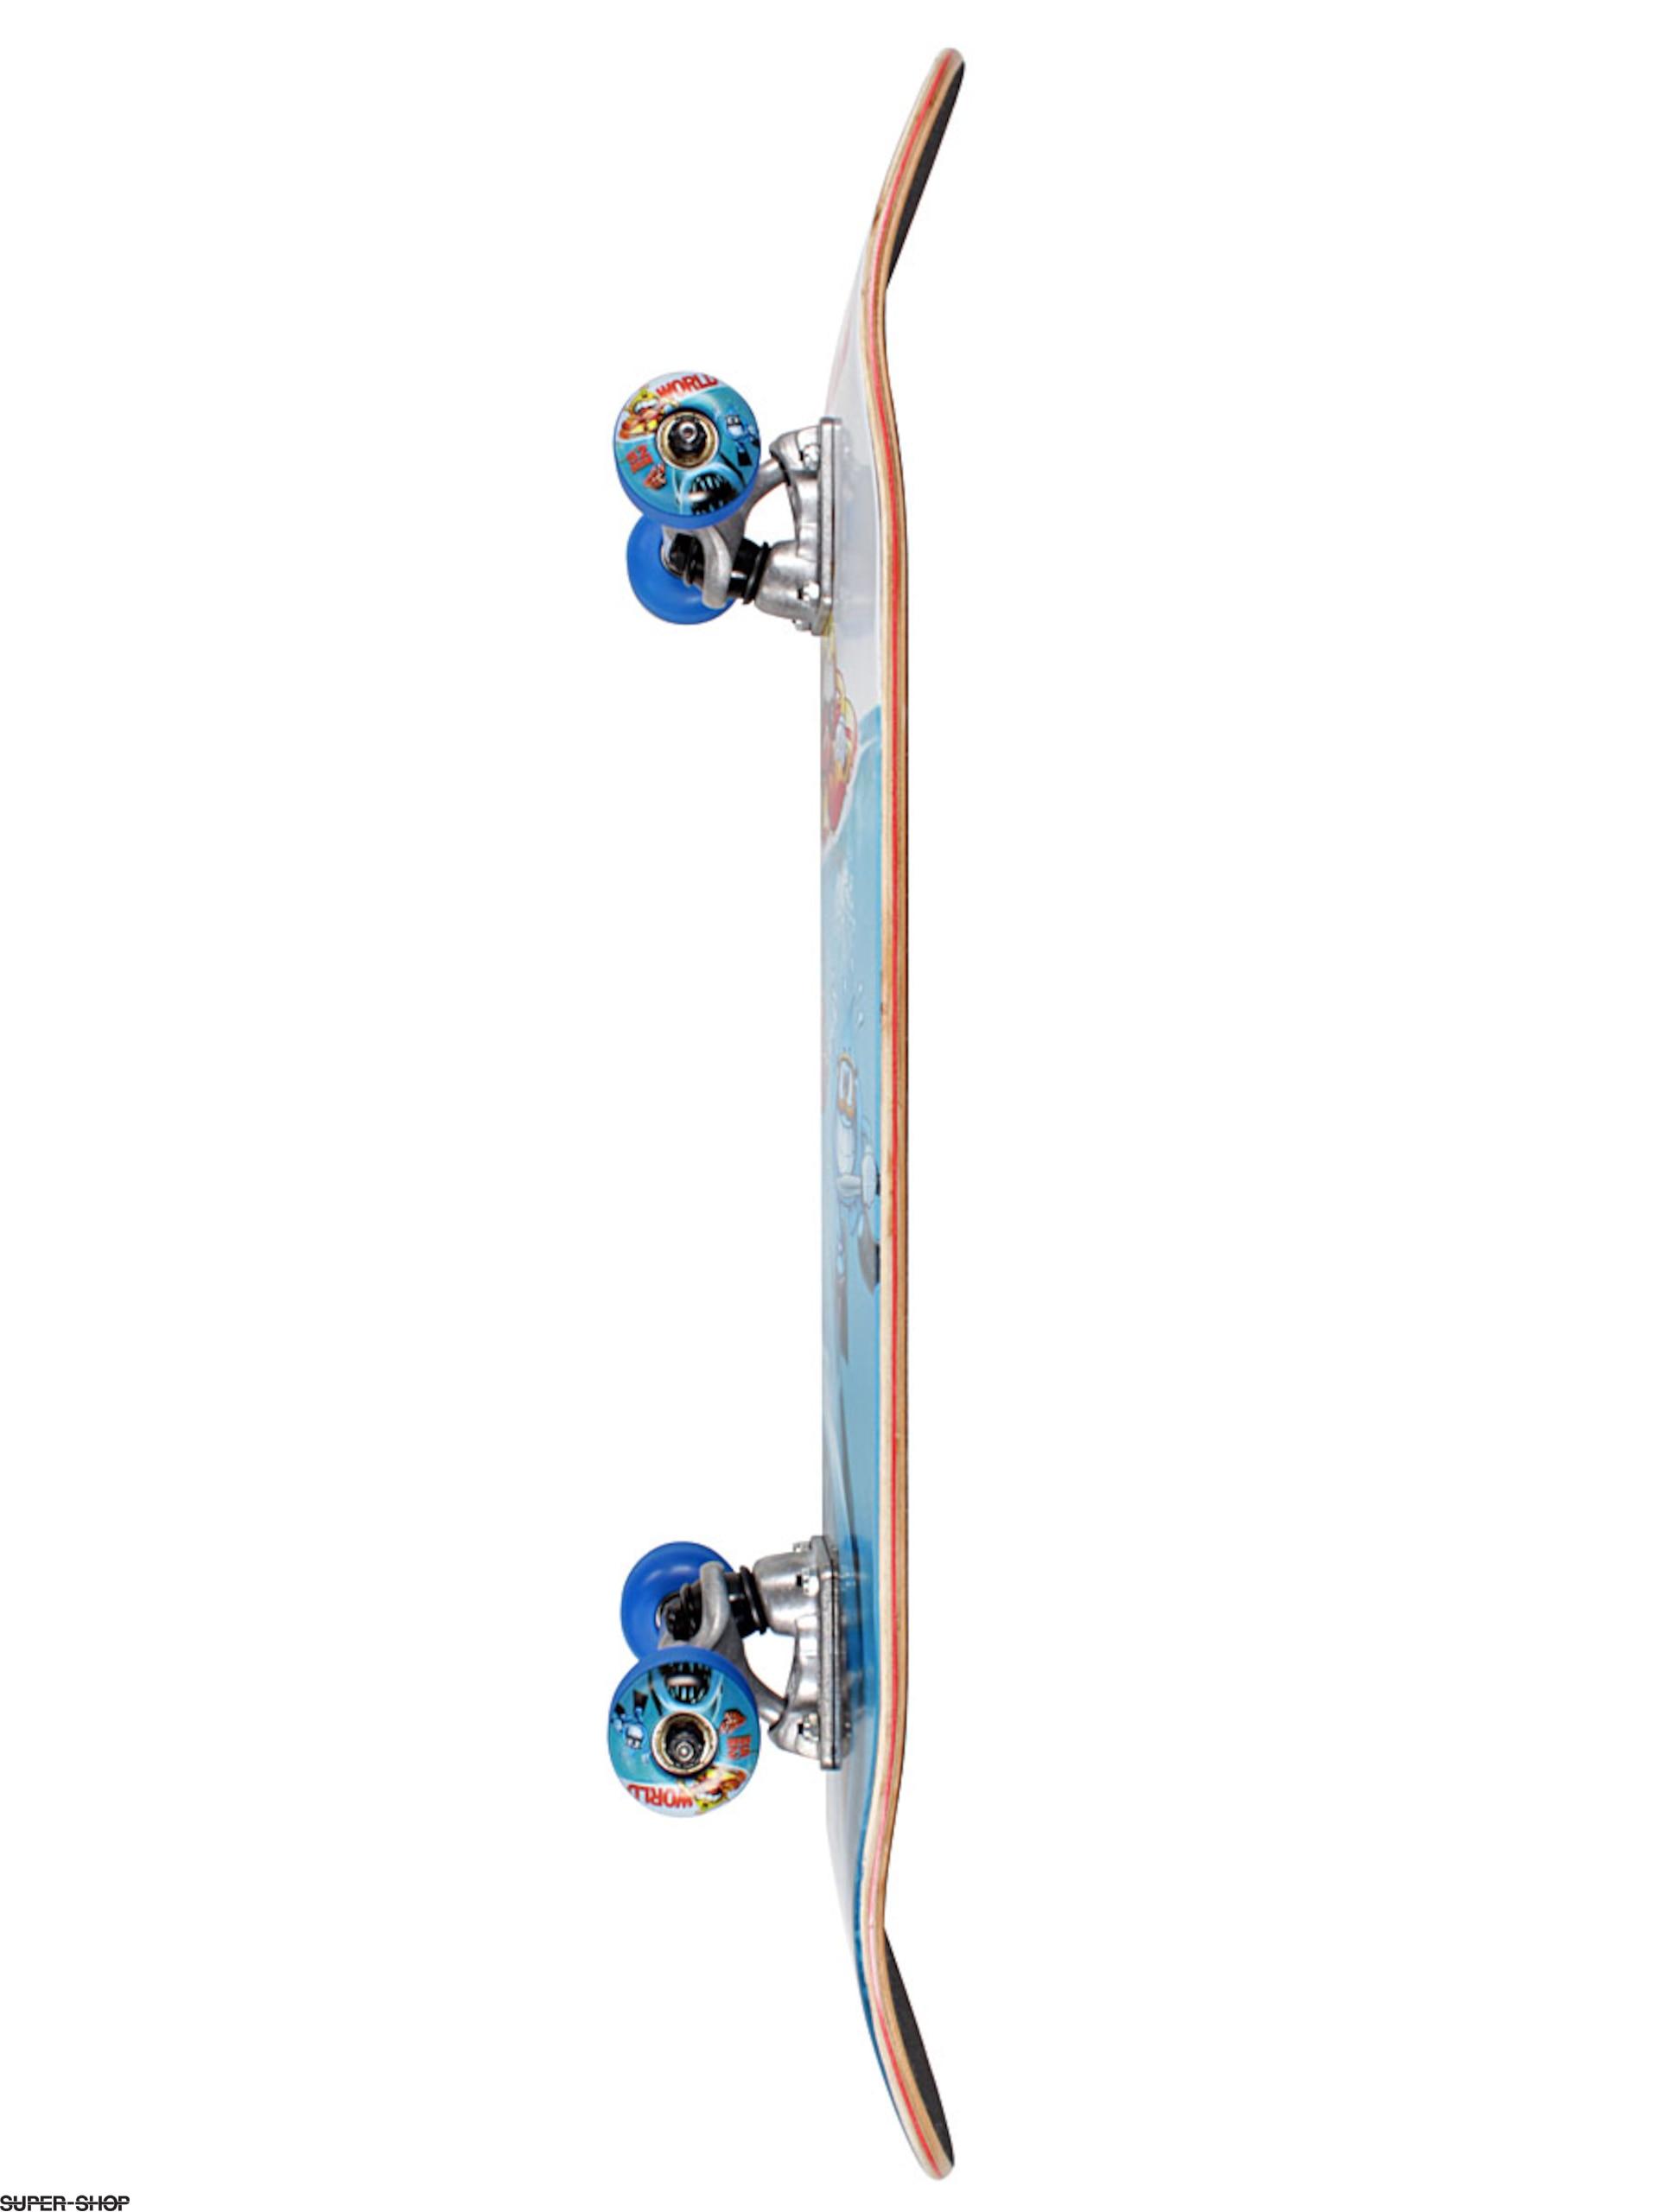 6c2e1eef989 World Industries Skateboard Sharb Bait 7.75